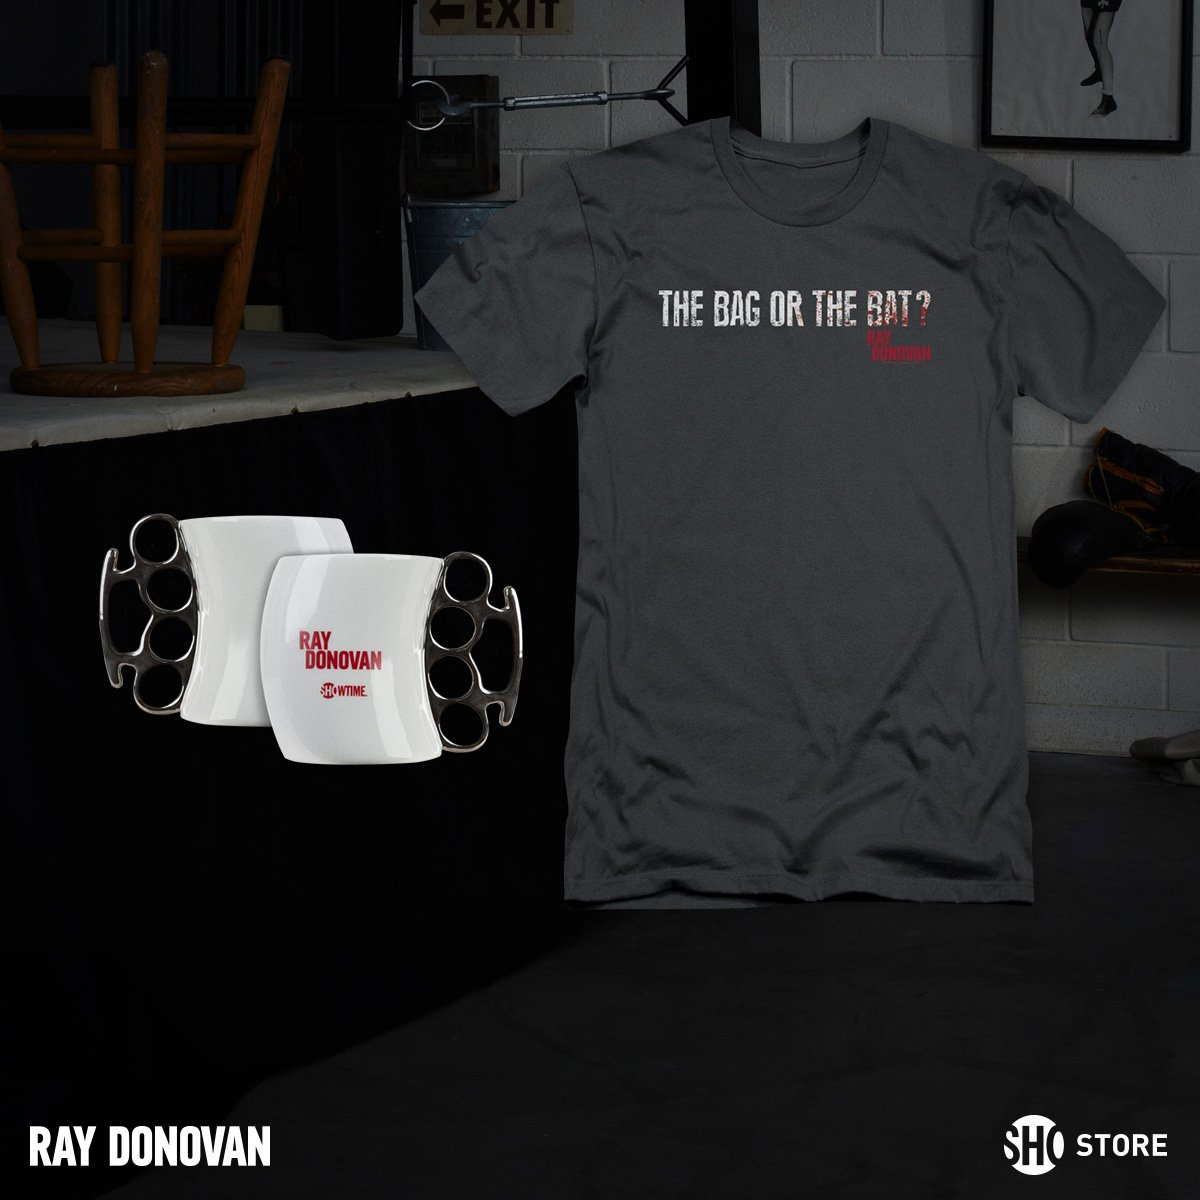 30a9cbe90929a Ray Donovan on Twitter